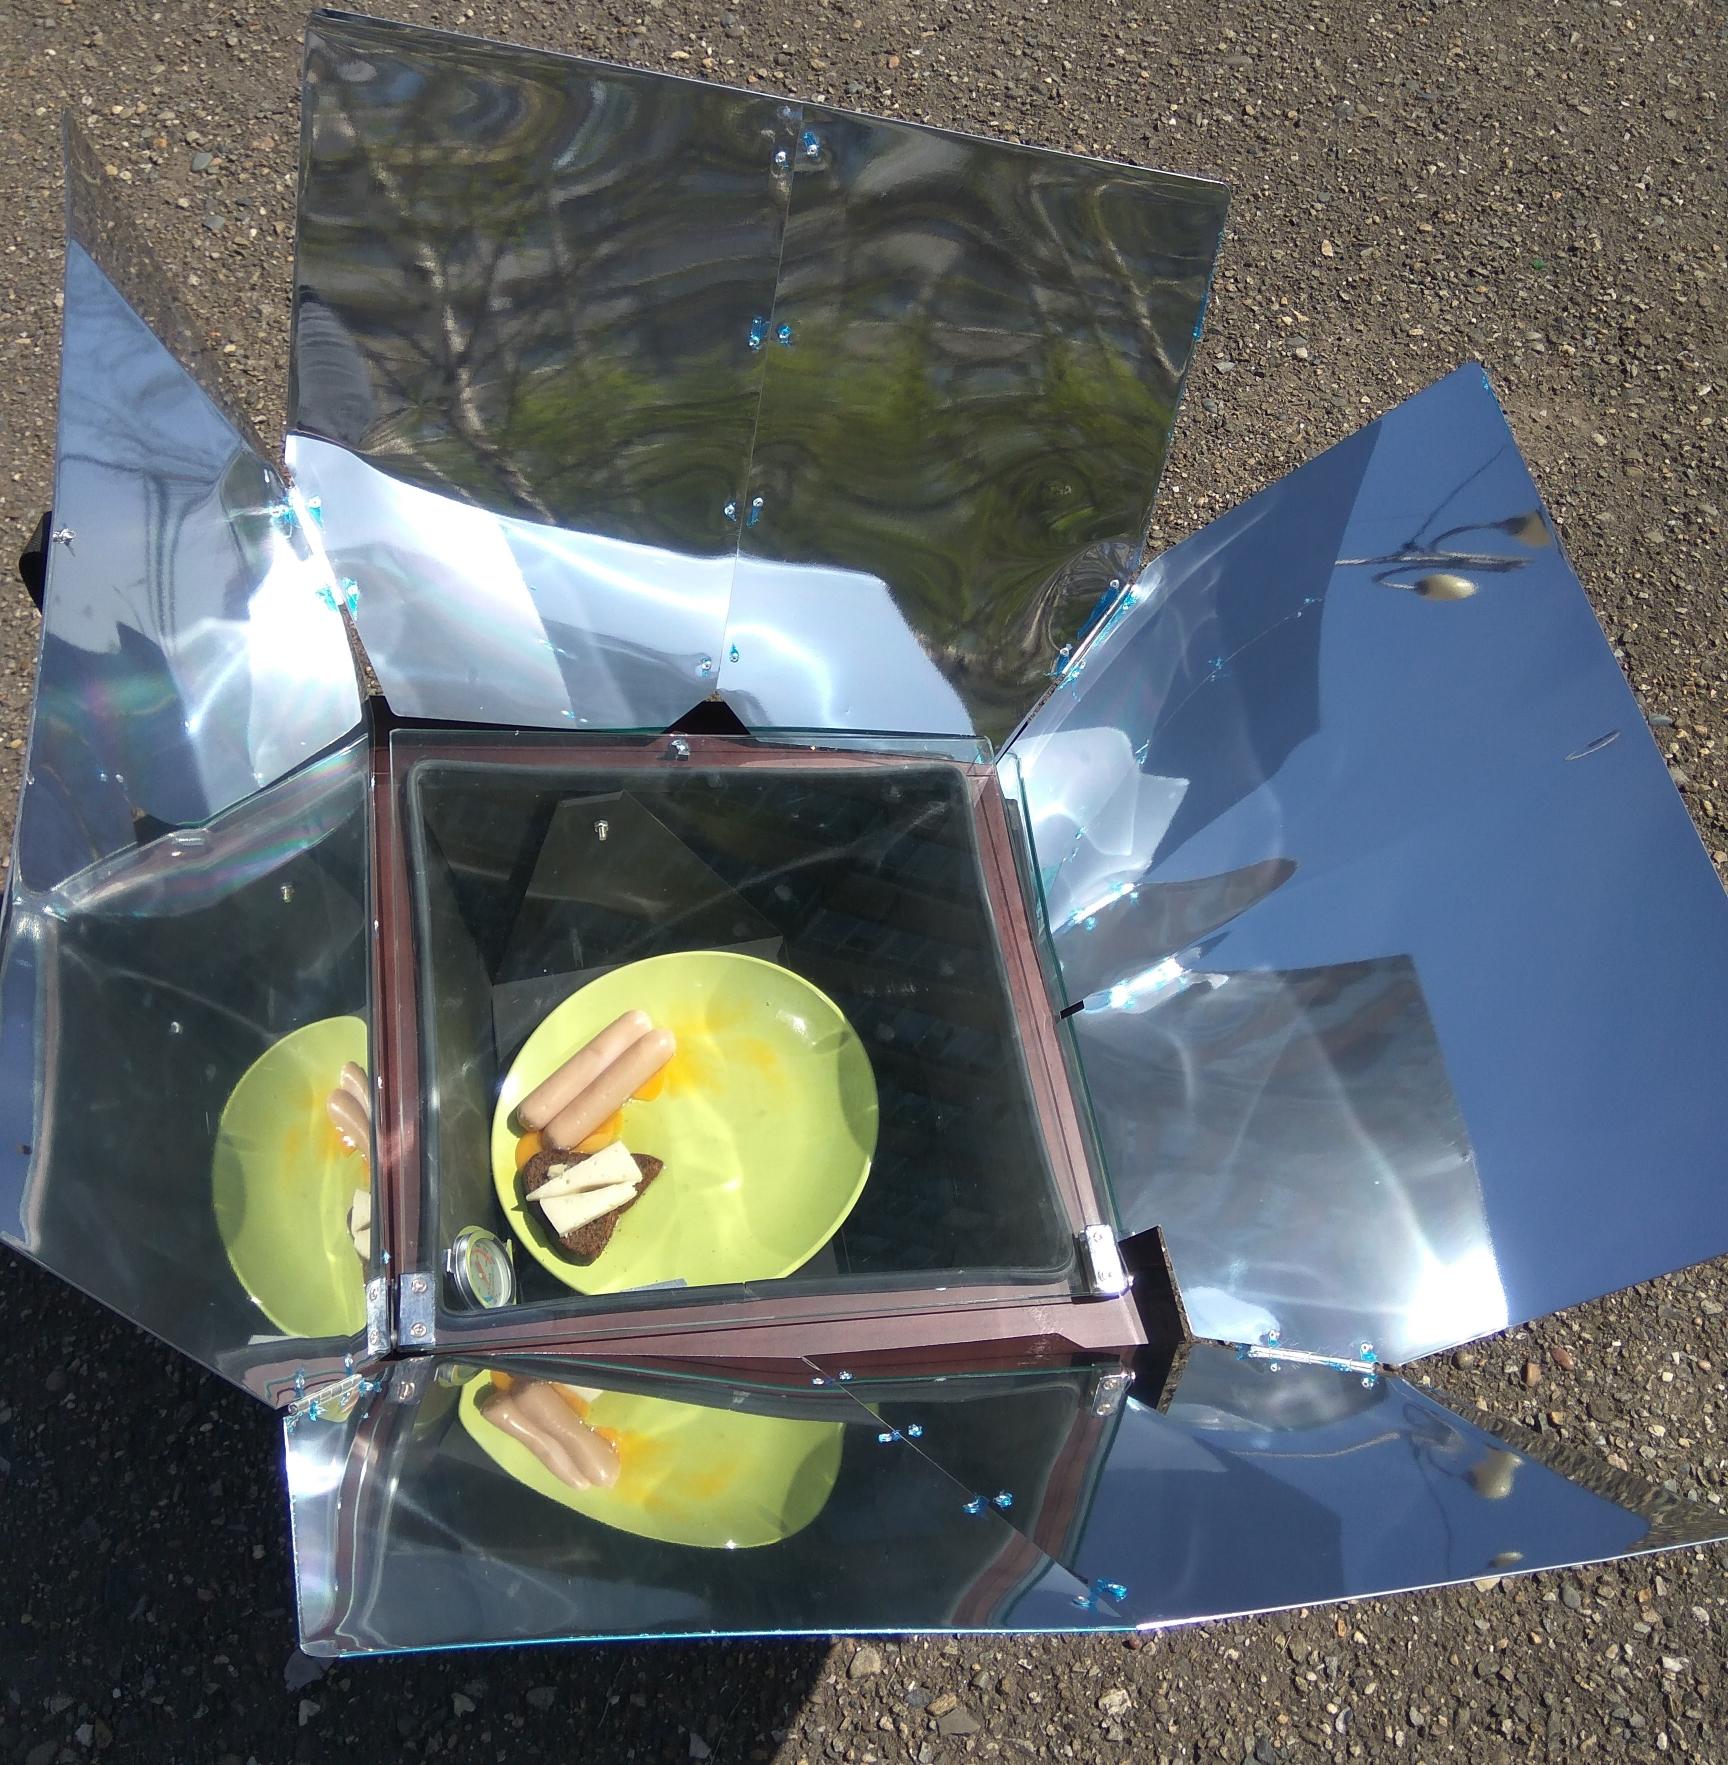 духовка на солнечных батареях